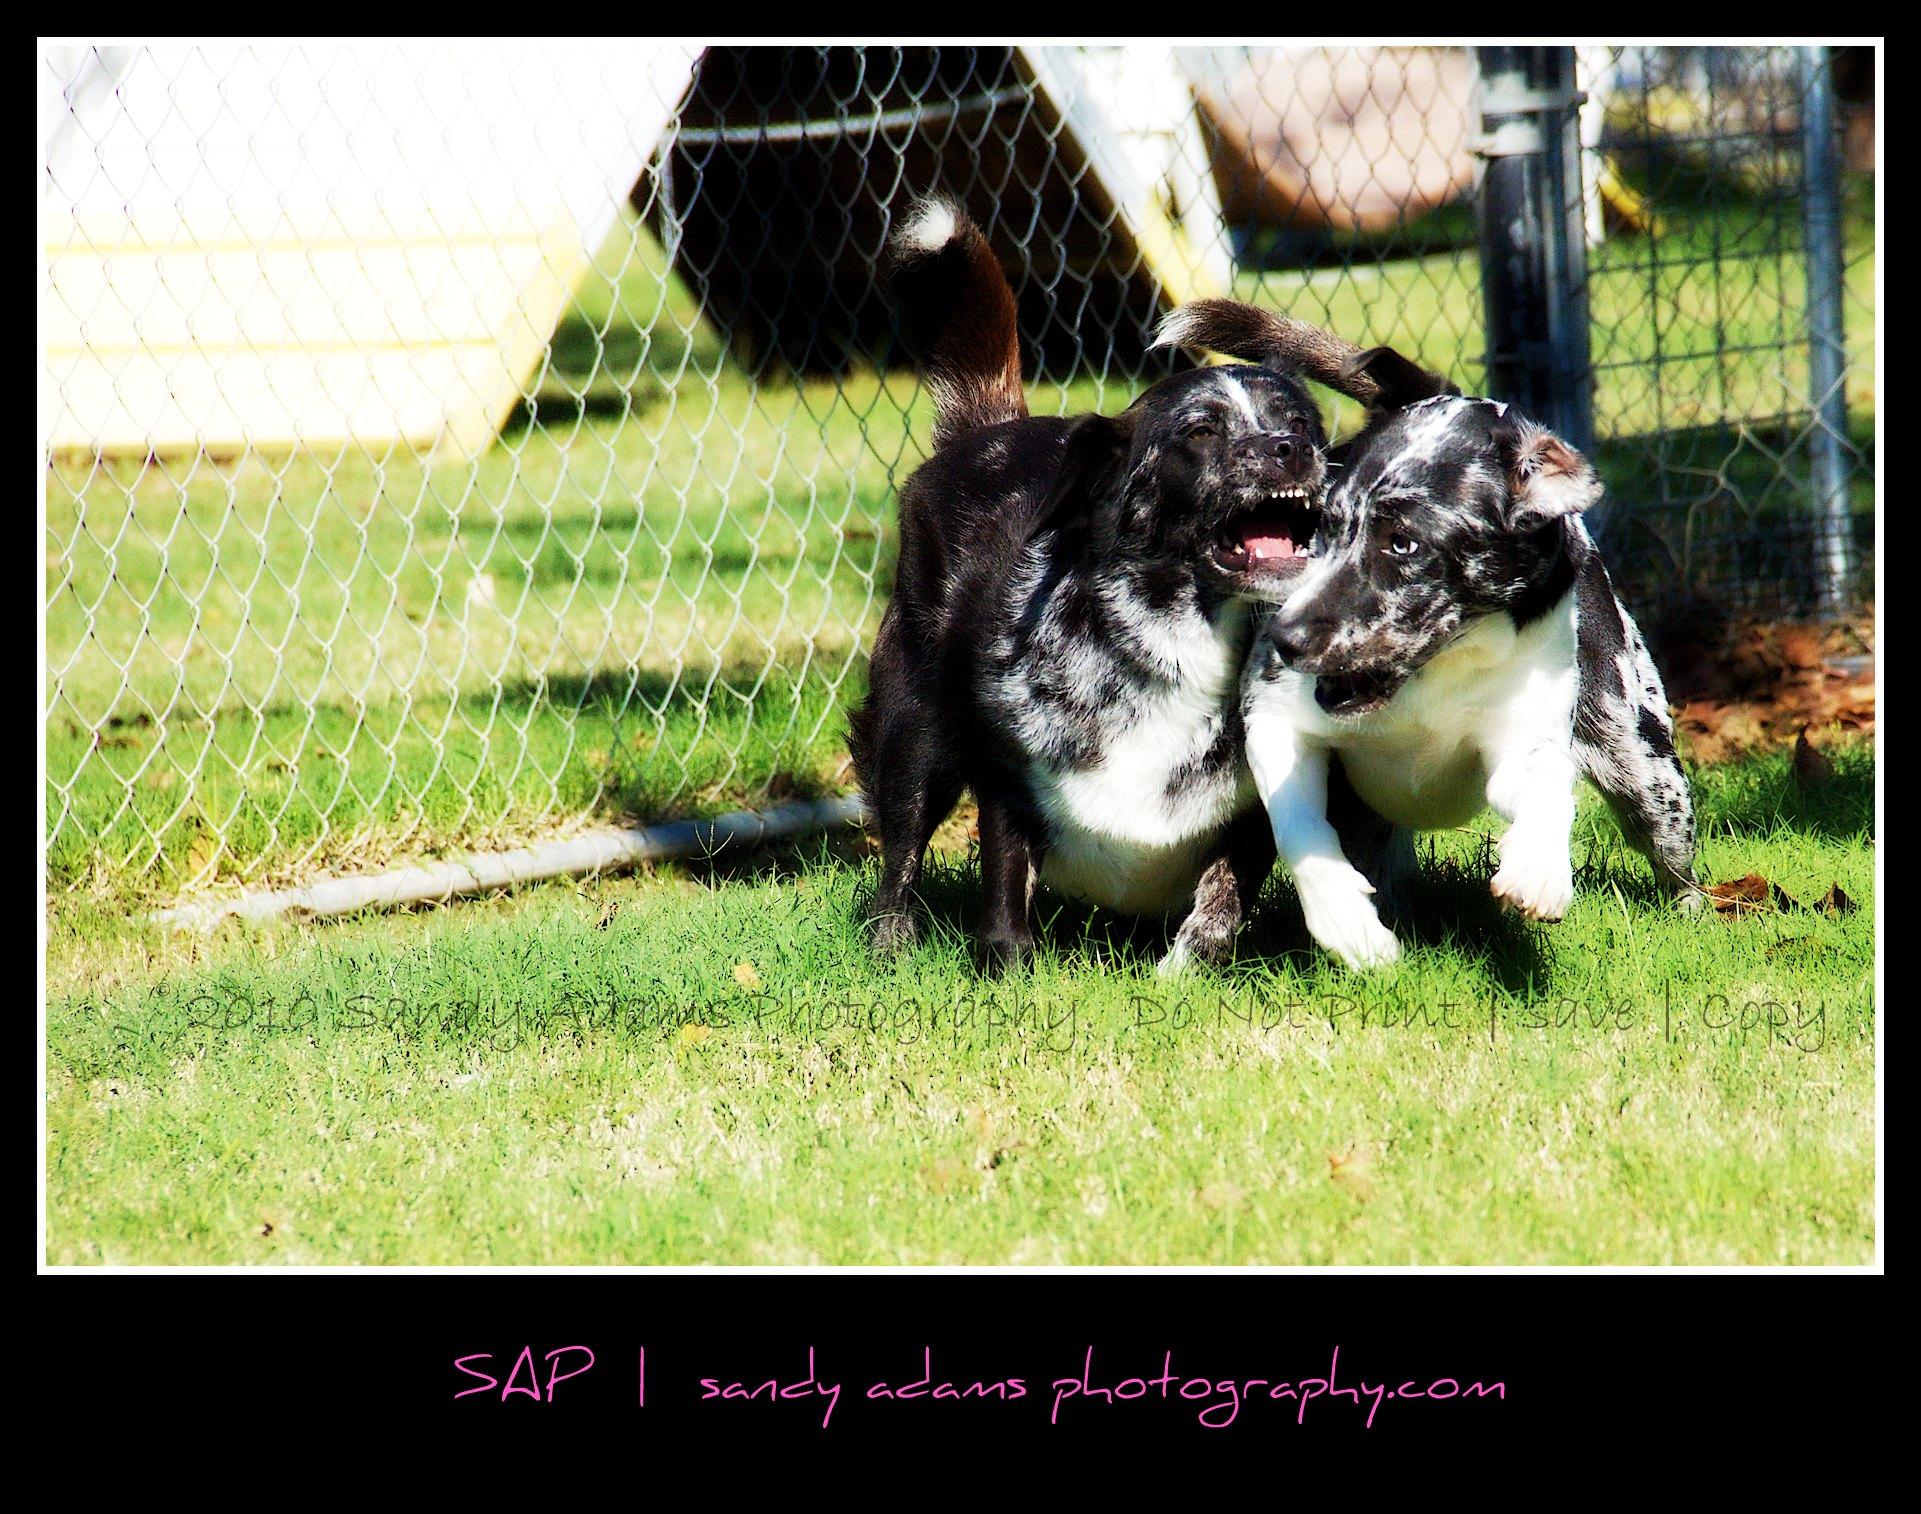 The Pet Palace.Net | SANDY ADAMS | 1921 x 1514 jpeg 680kB